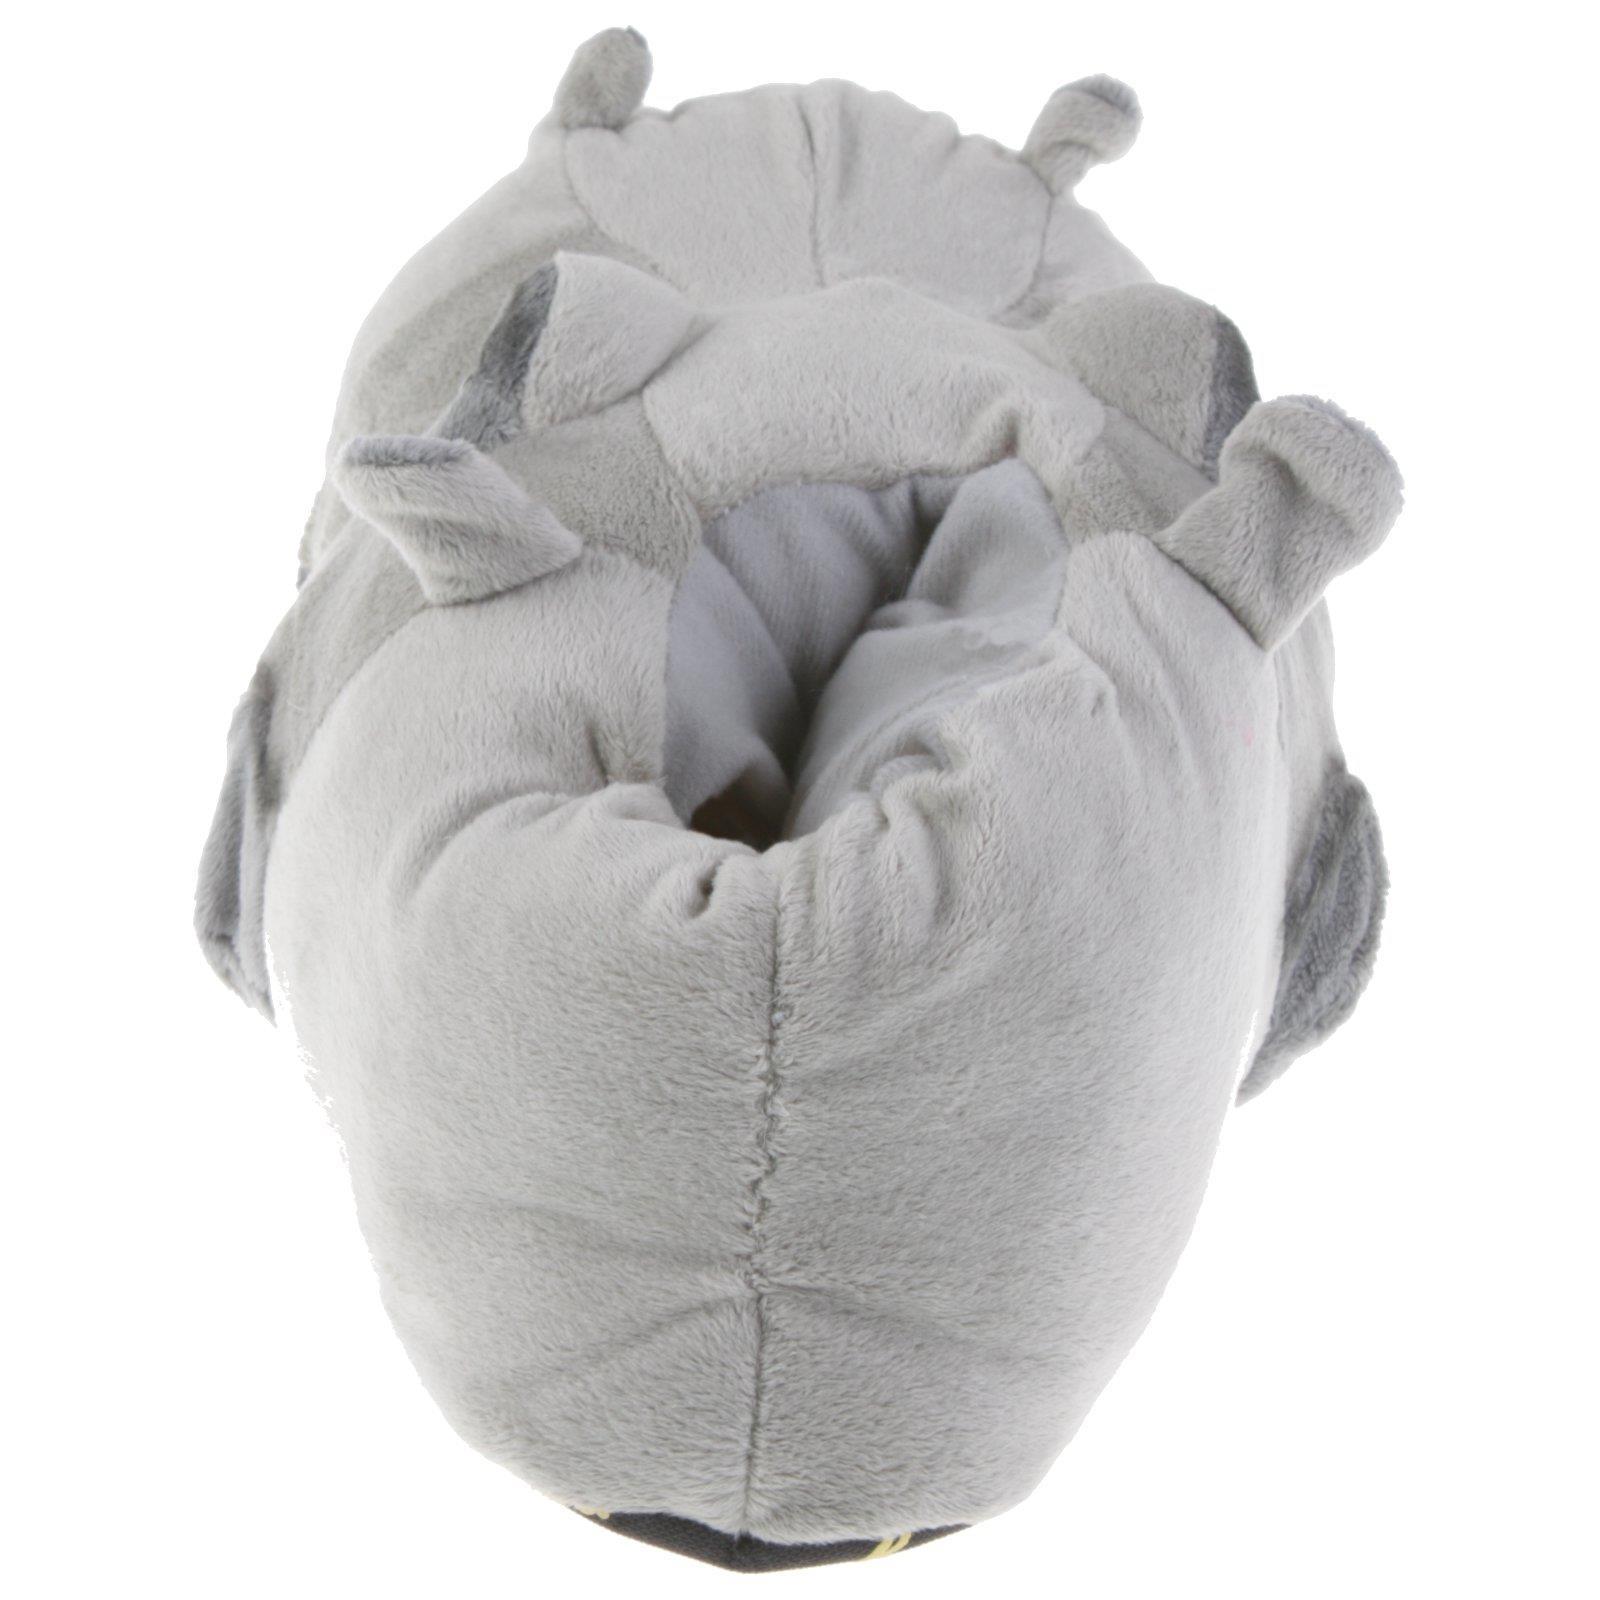 Flusspferd-Hippo-Tier-Hausschuhe-Pantoffel-Schlappen-Nilpferd-Pluesch-36-48 Indexbild 9